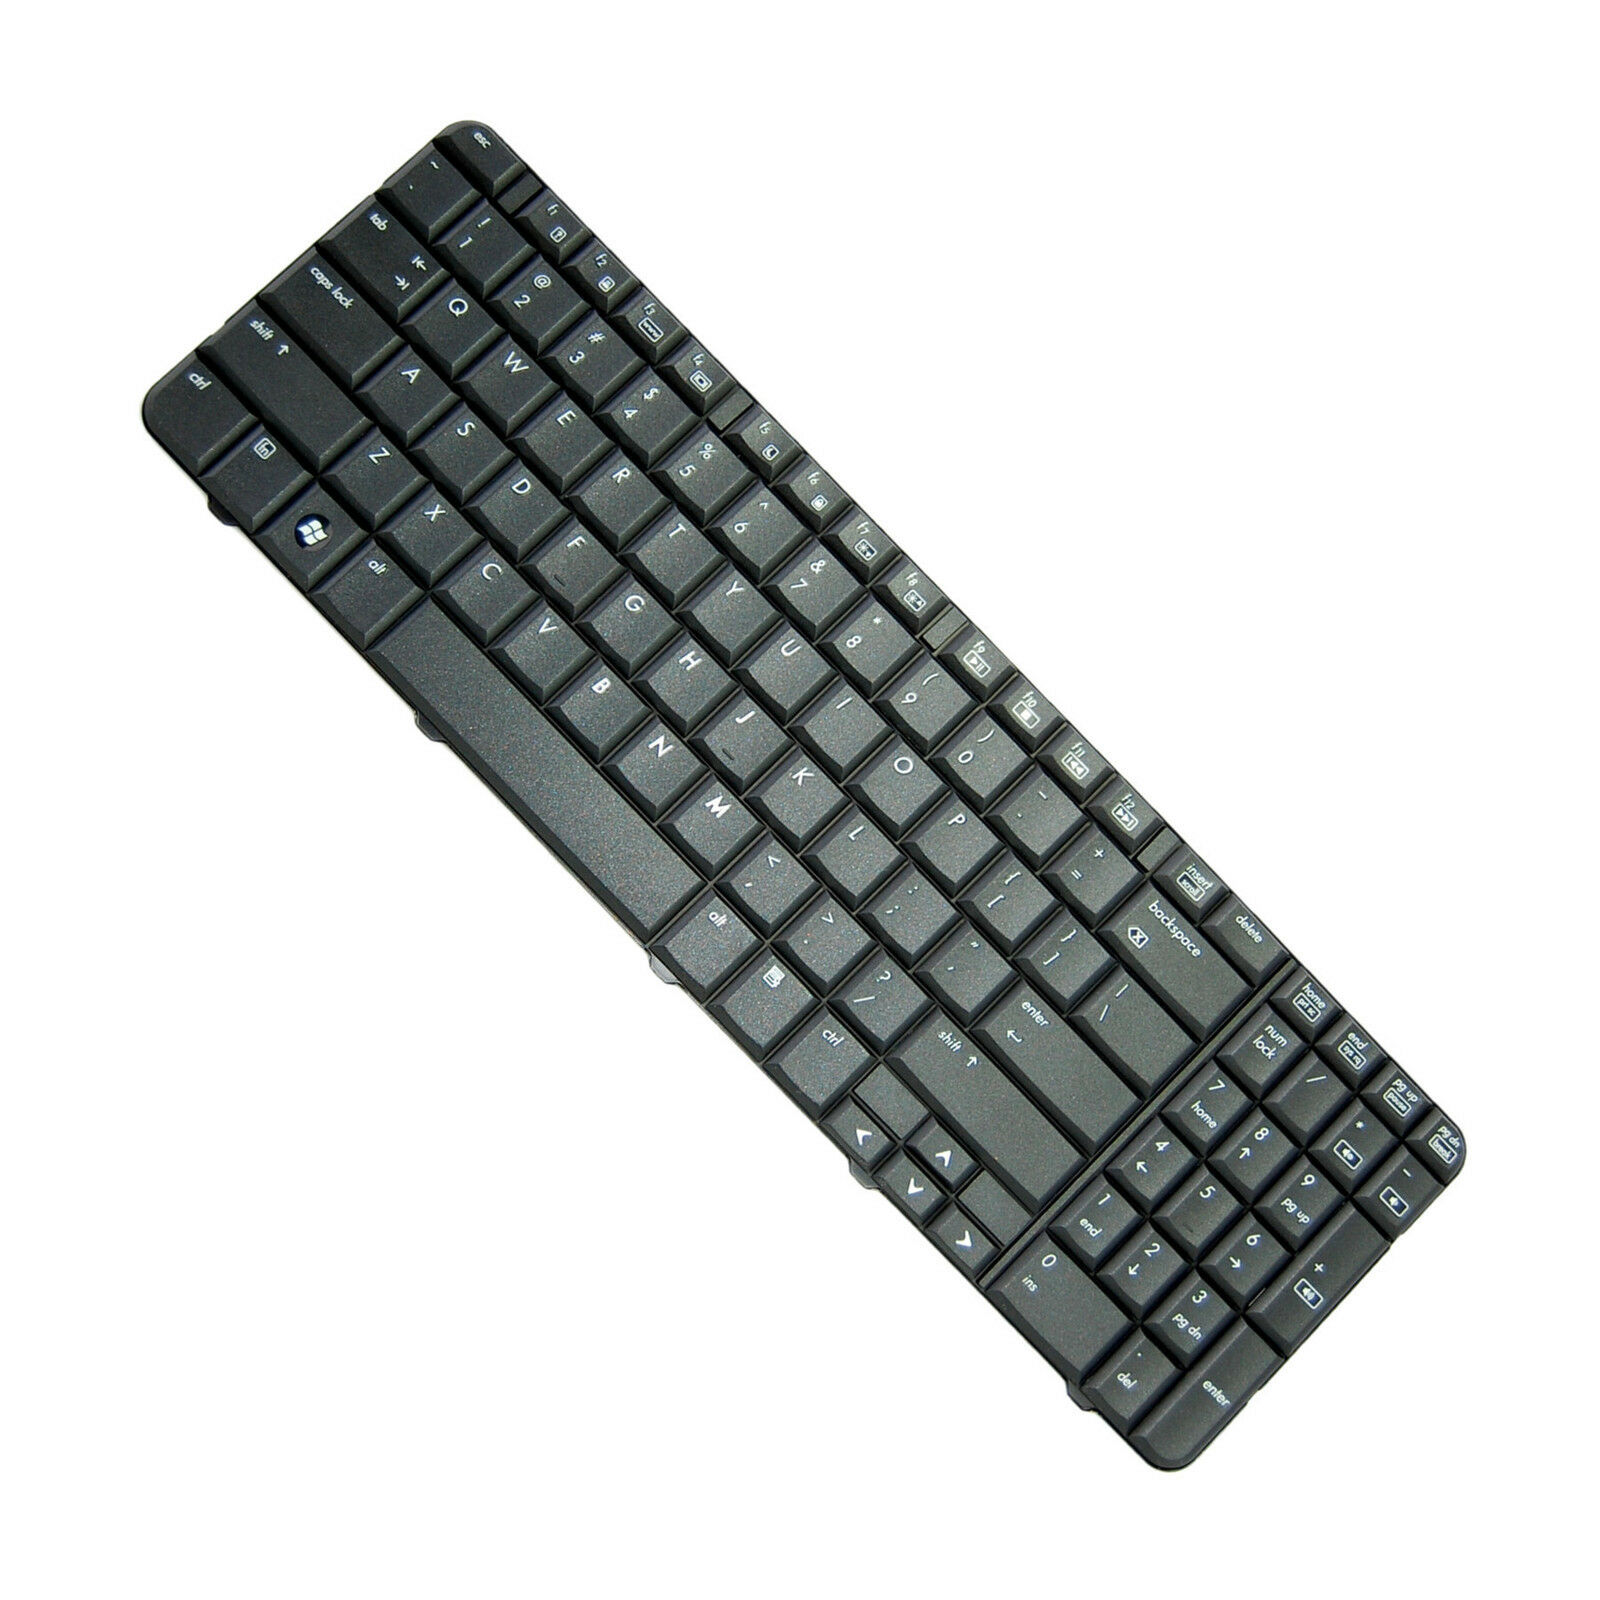 HQRP Teclado para HP G60-533CL / G60-535DX / G60-536NR / G60-538CA ordenador